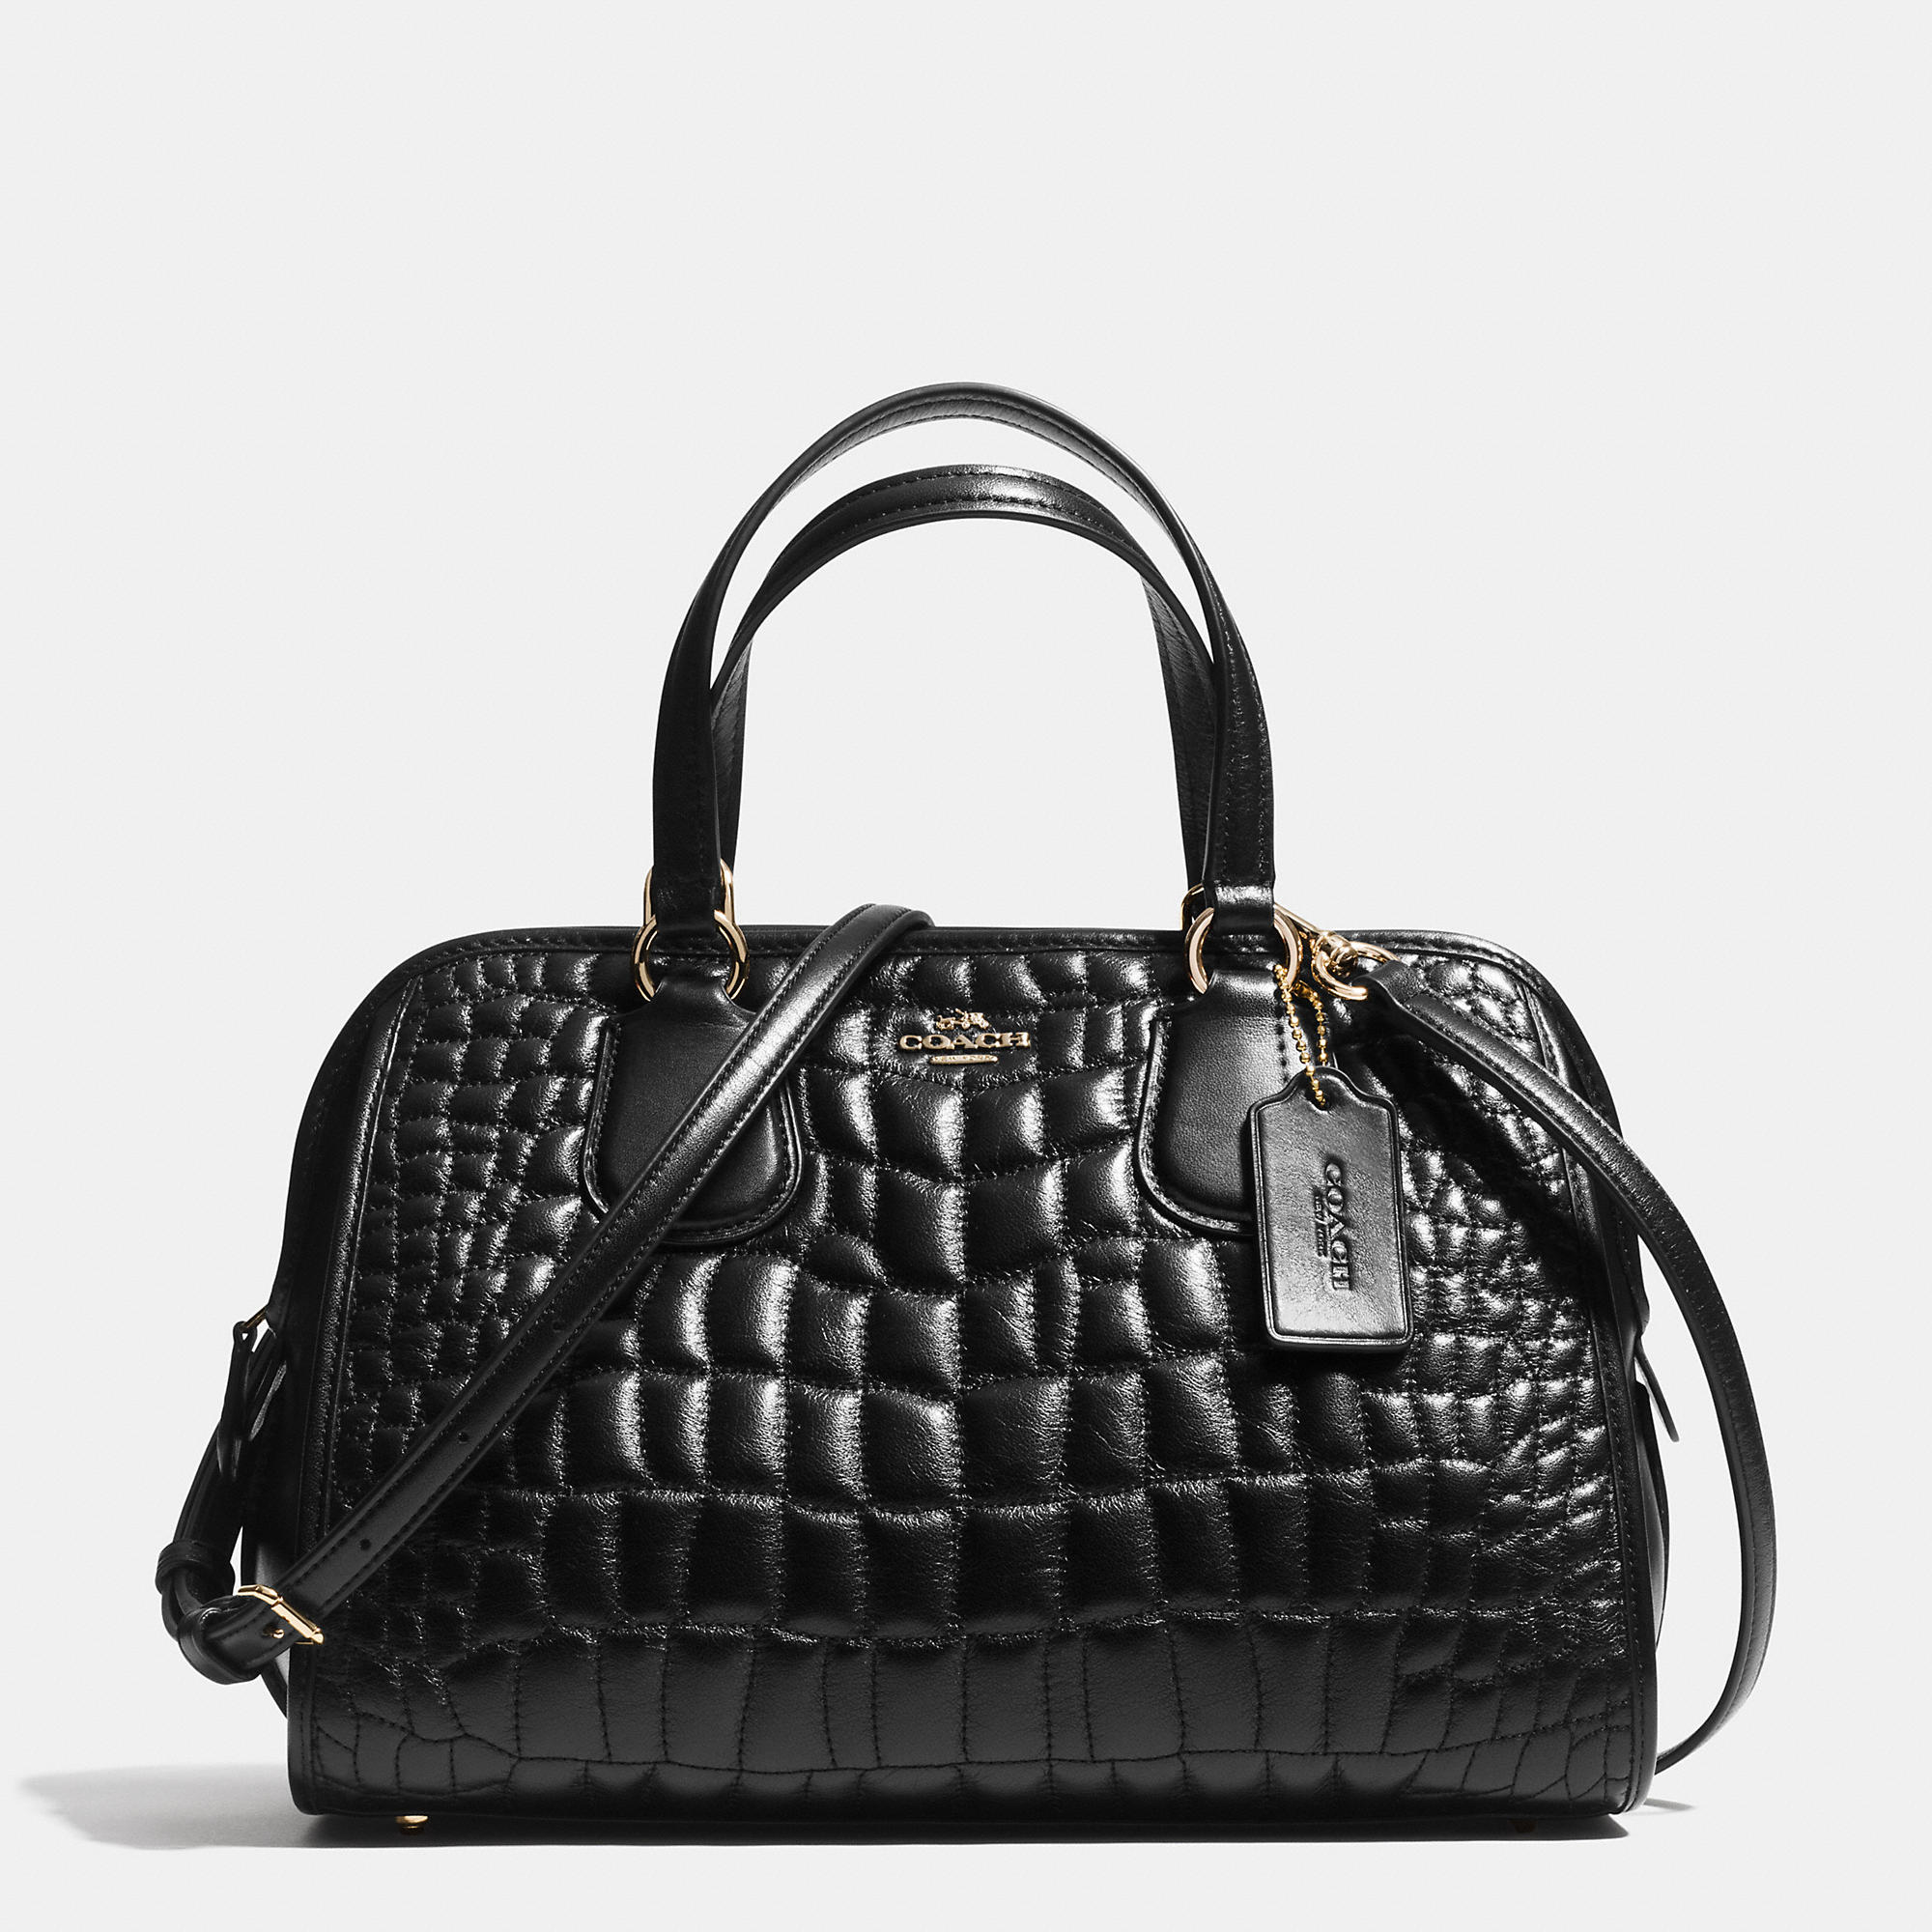 Lyst Coach Nolita Satchel In Quilted Croc Leather In Black